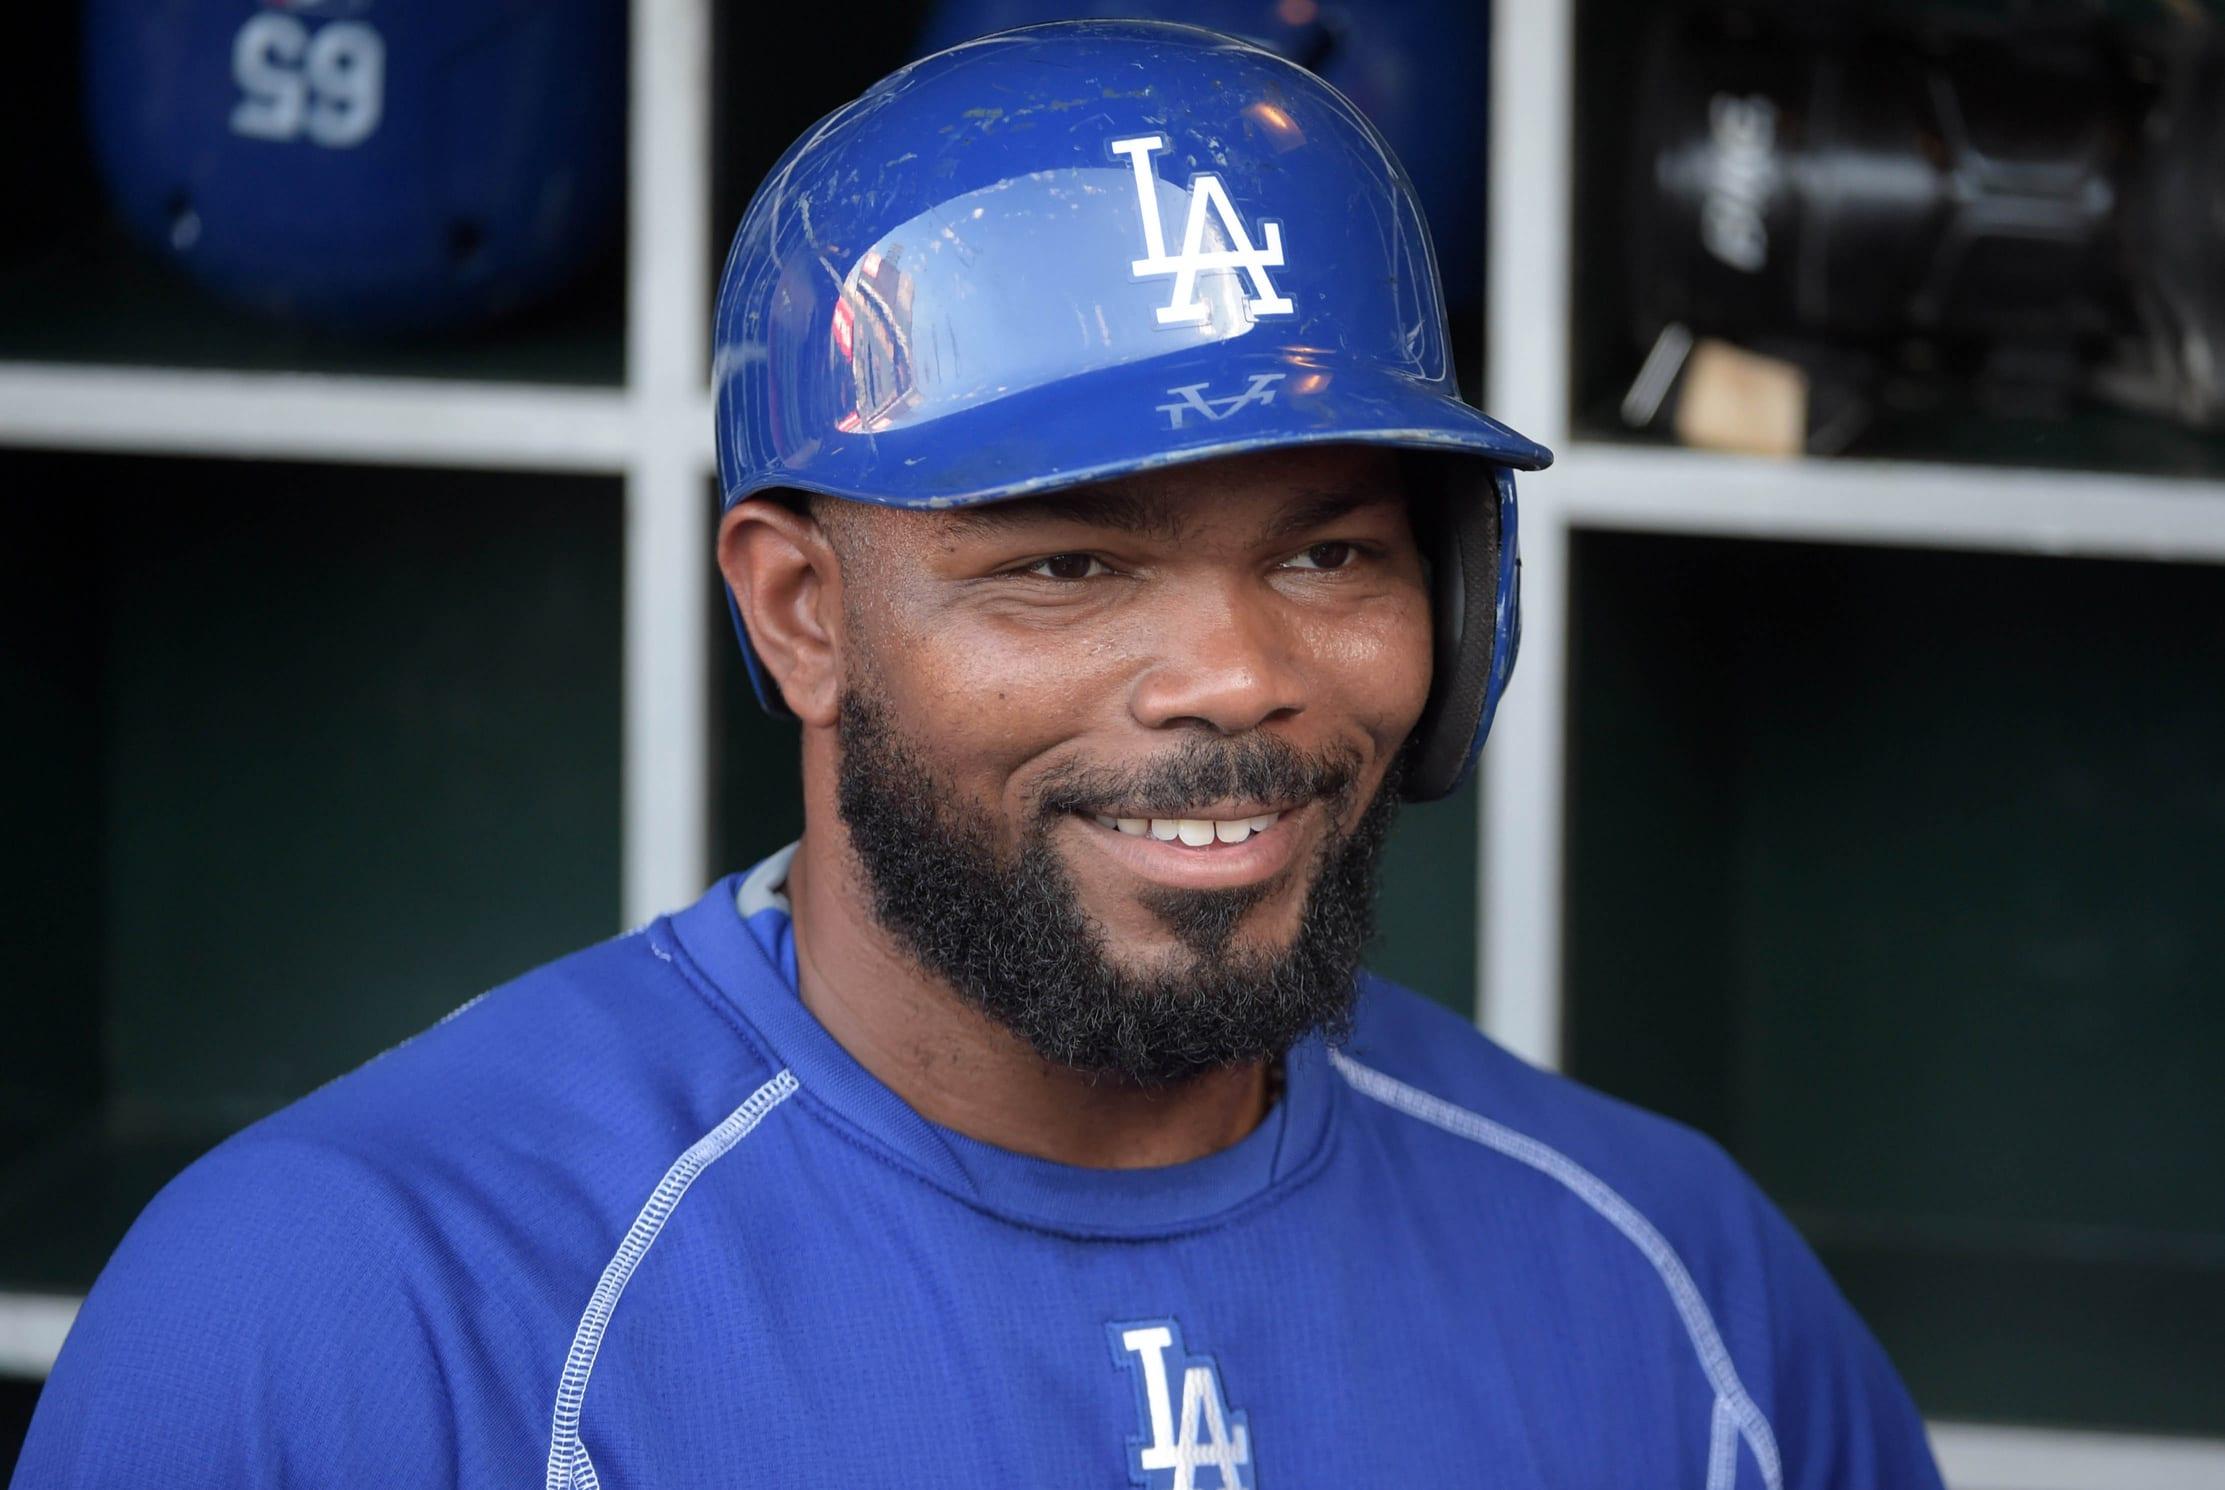 Dodgers News: Howie Kendrick Still Experiencing Hamstring Tightness